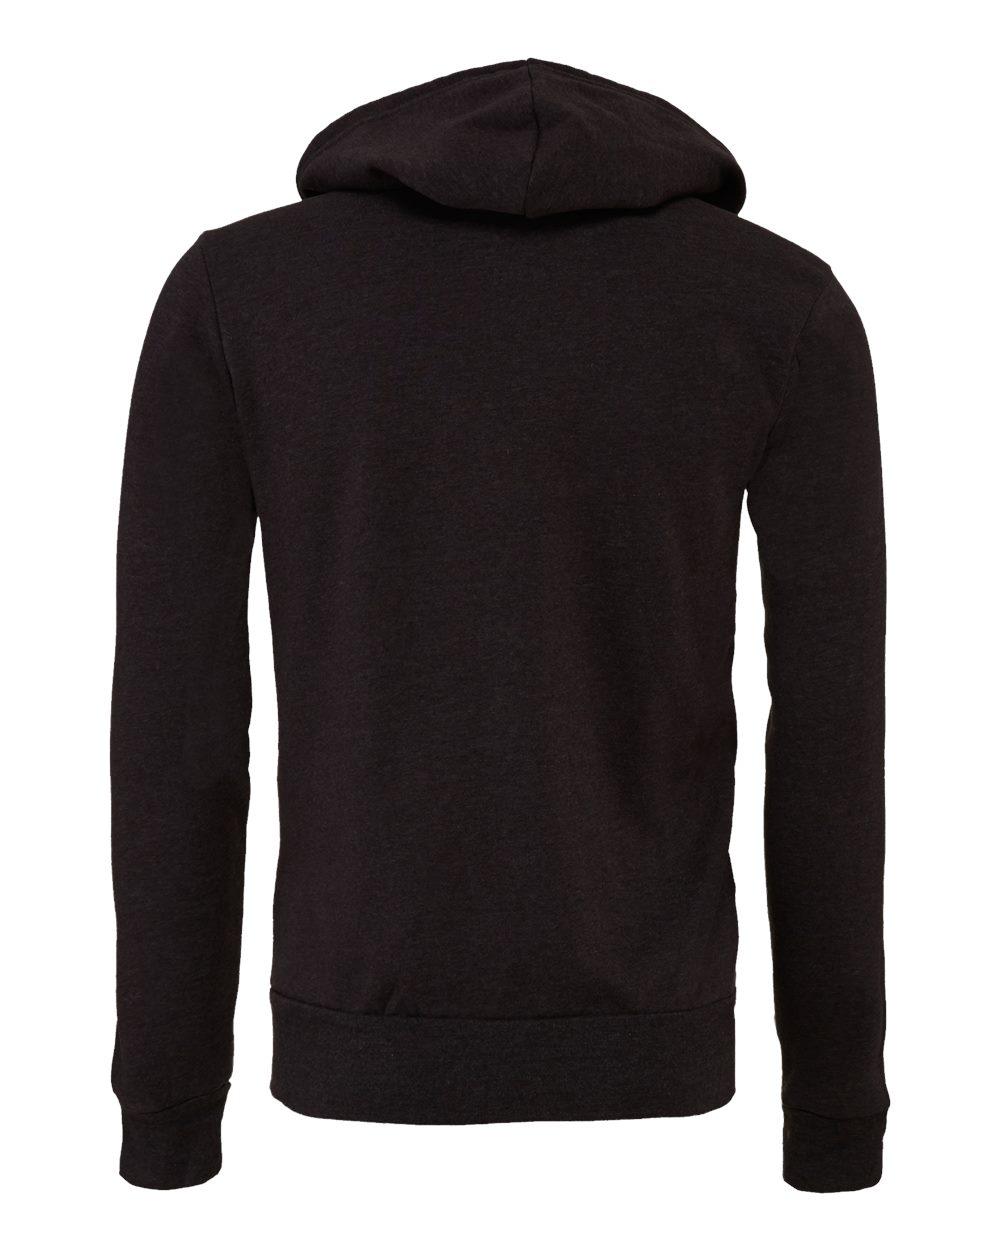 Bella-Canvas-Unisex-Full-Zip-Up-Hooded-Sweatshirt-Blank-Hoodie-3739-up-to-3XL thumbnail 19